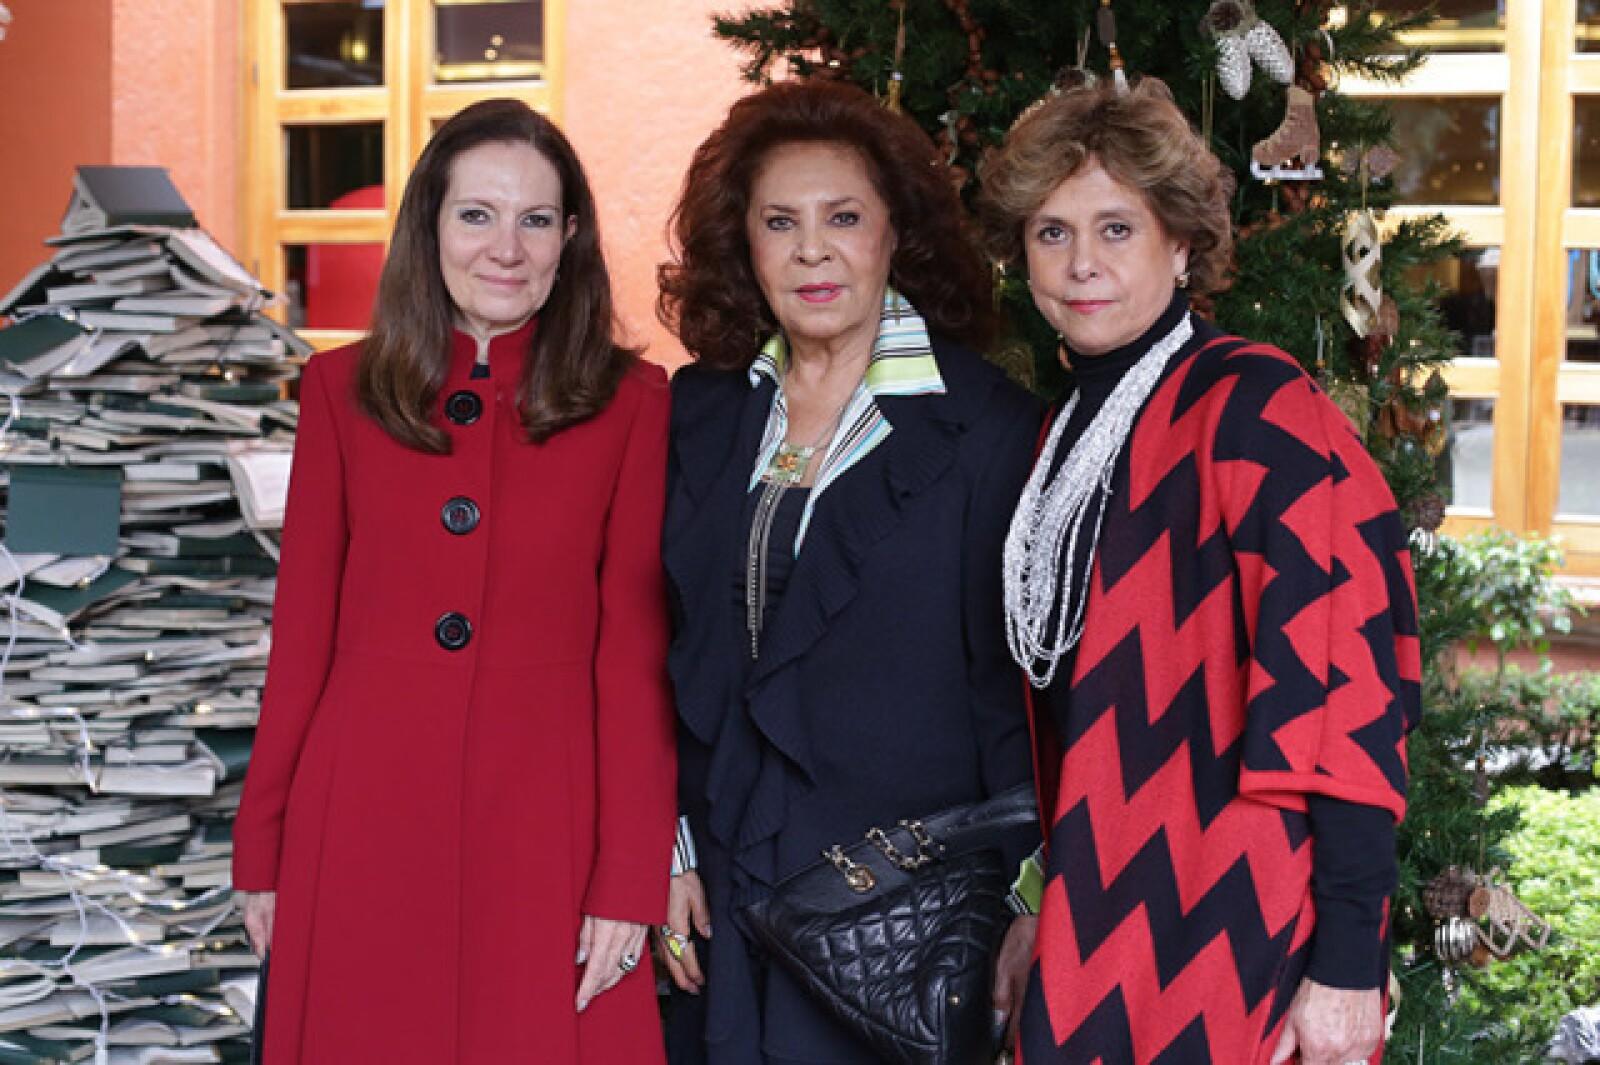 Nely Quezada,Maite Soberanes y Marce Girald